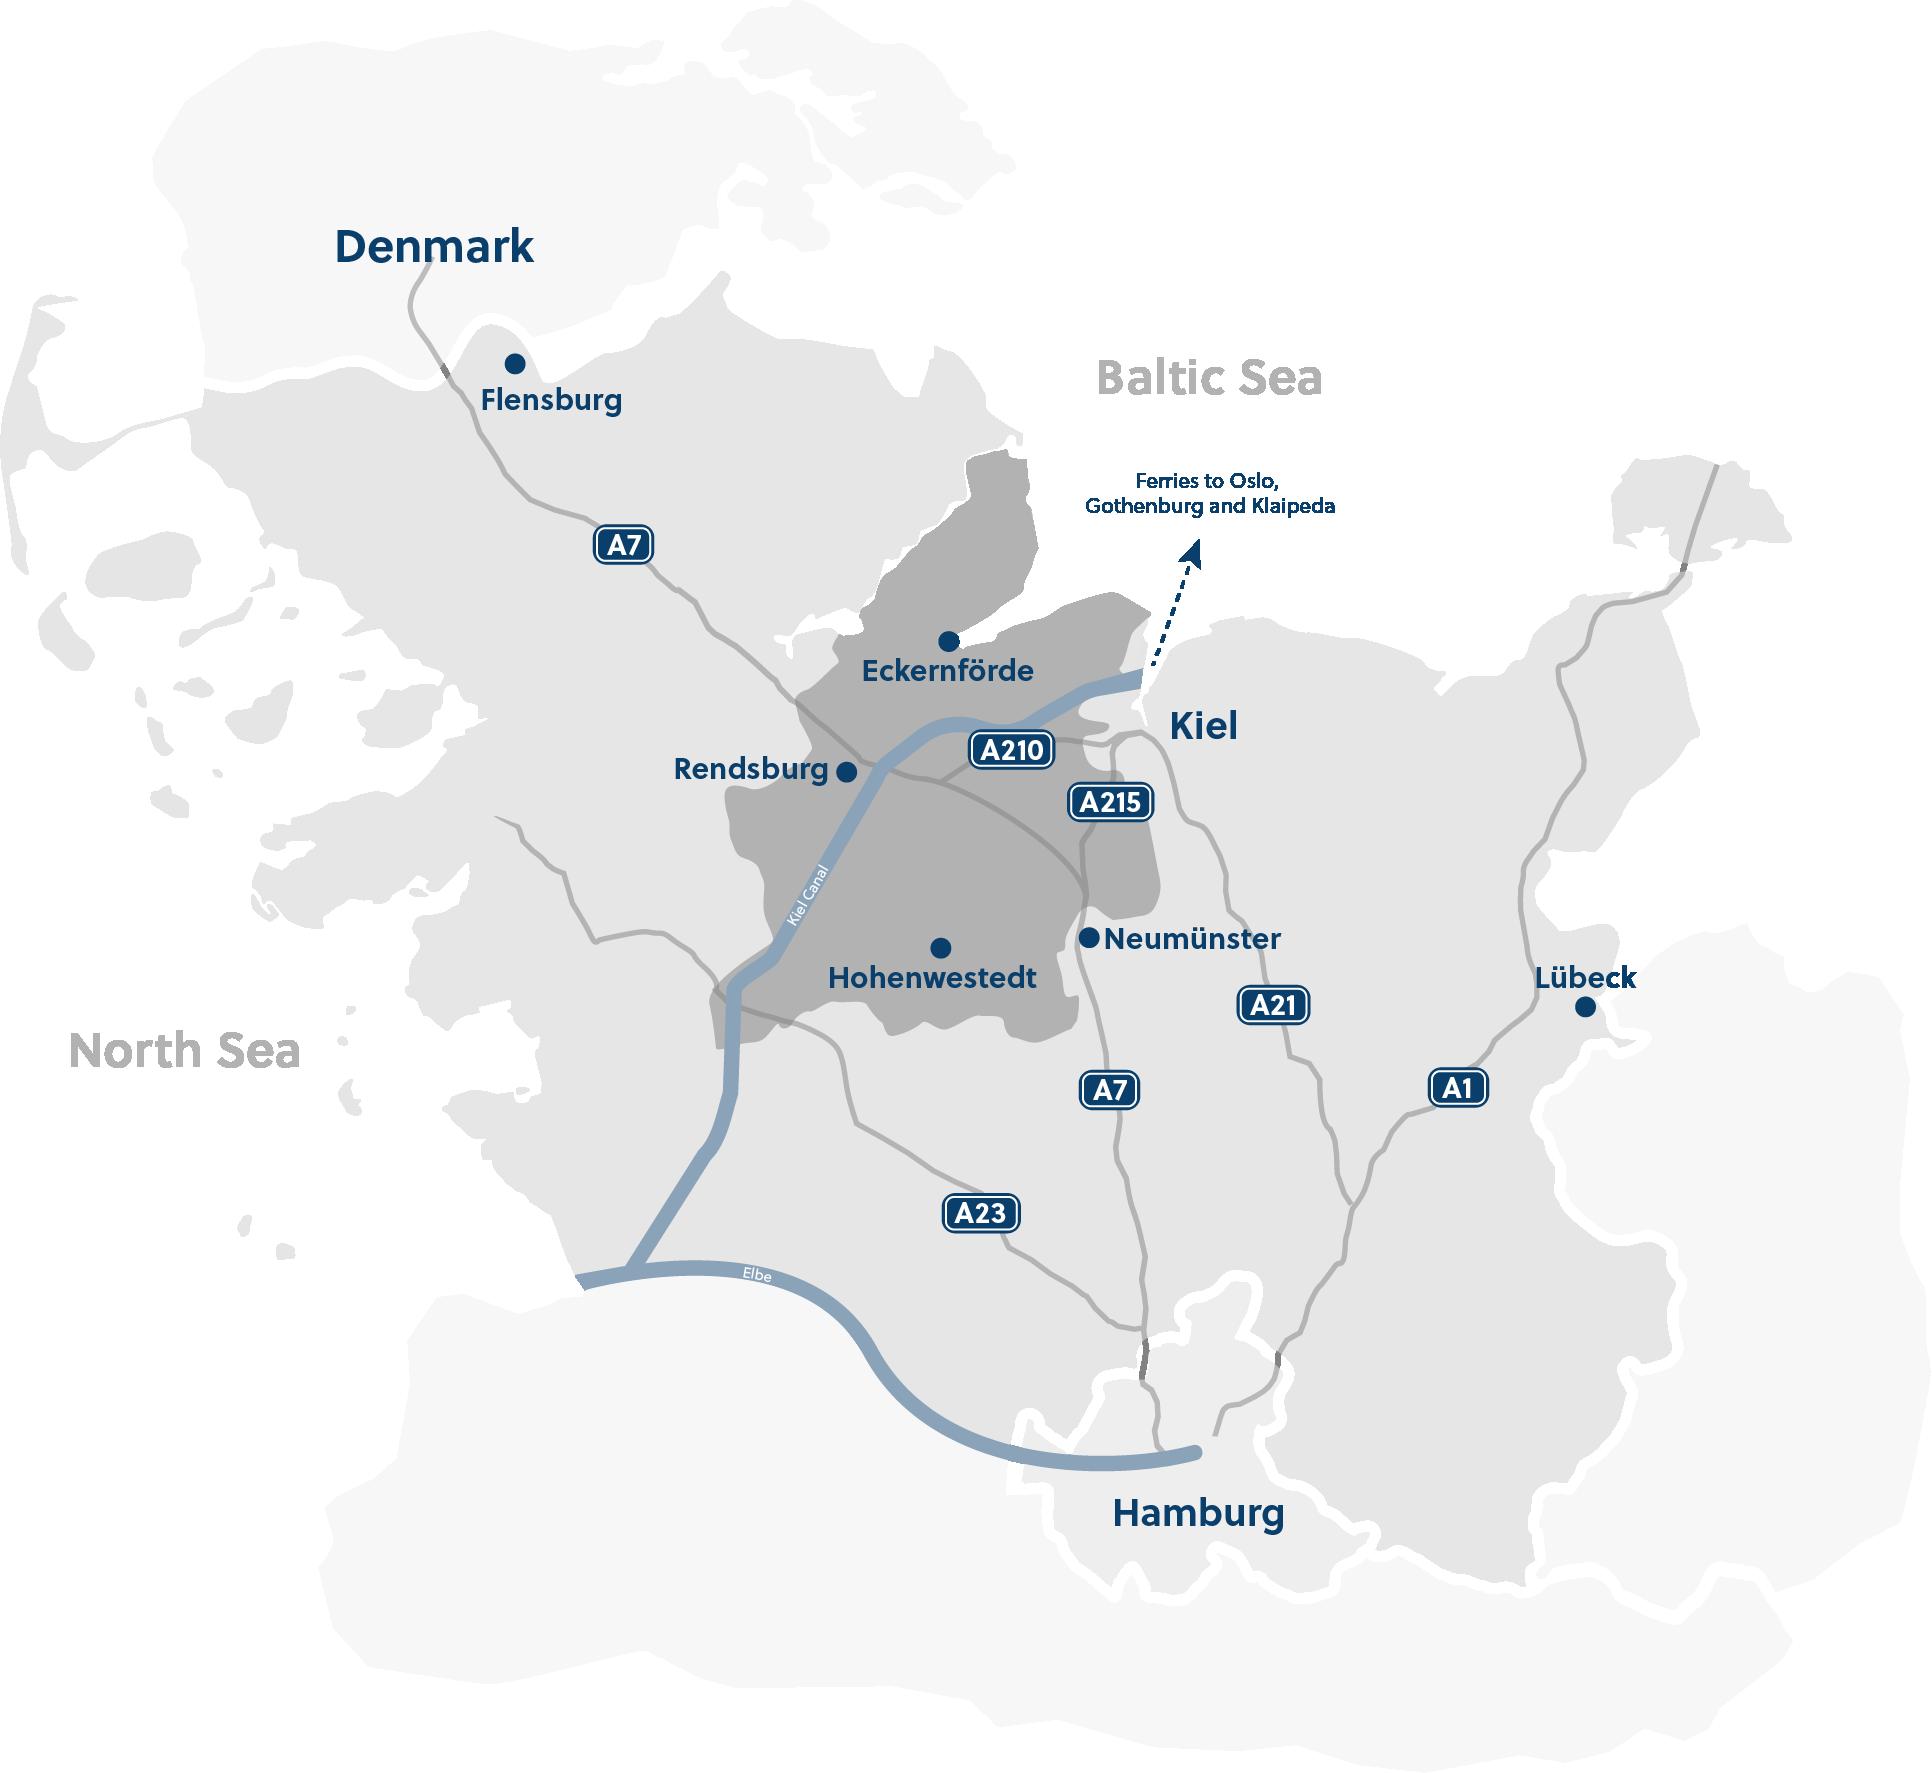 wfg-map-location